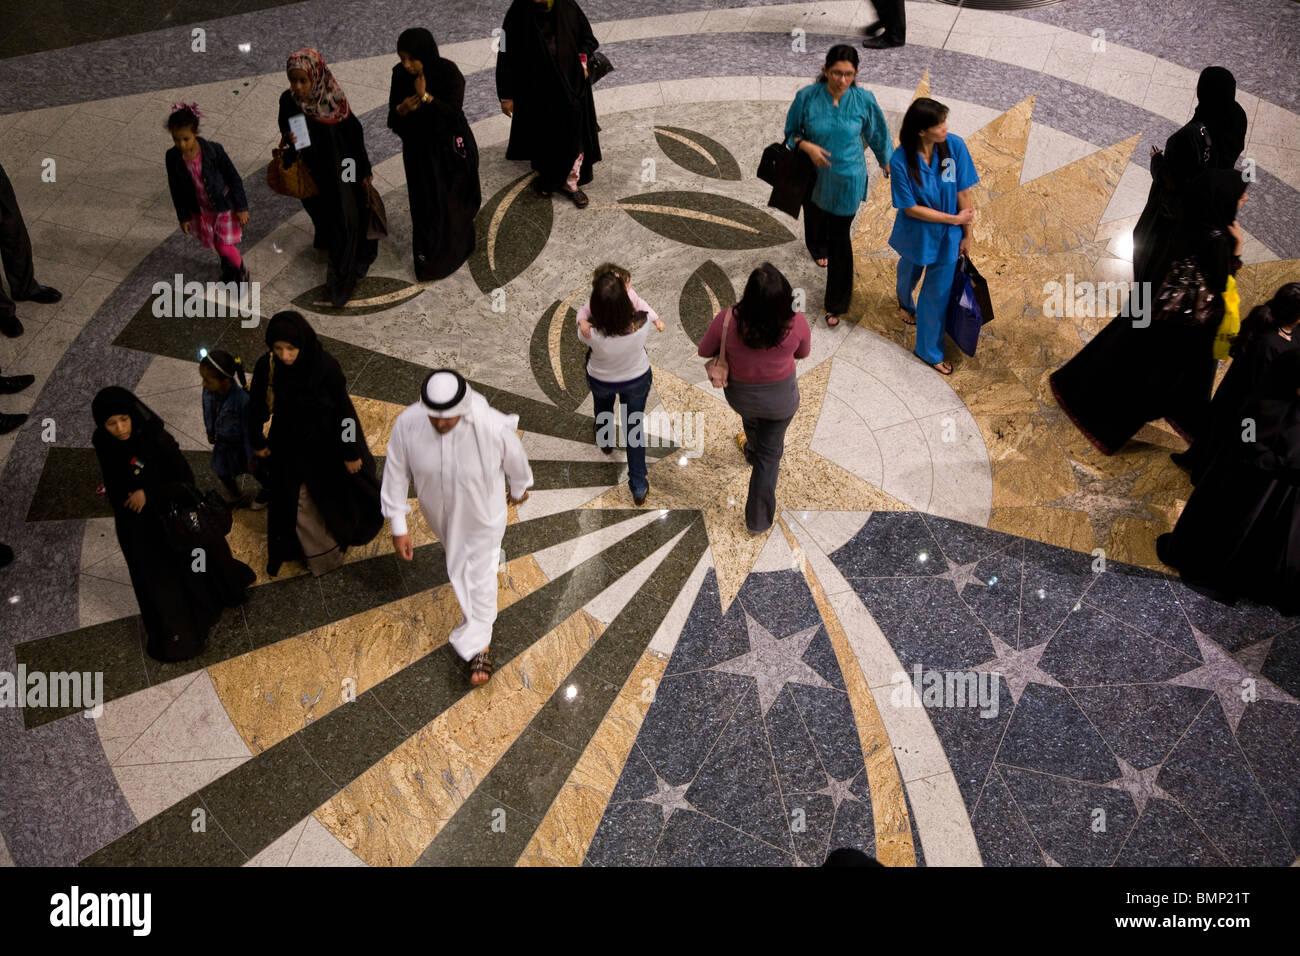 BAHRAIN CITY CENTRE SHOPPING MALL - Stock Image